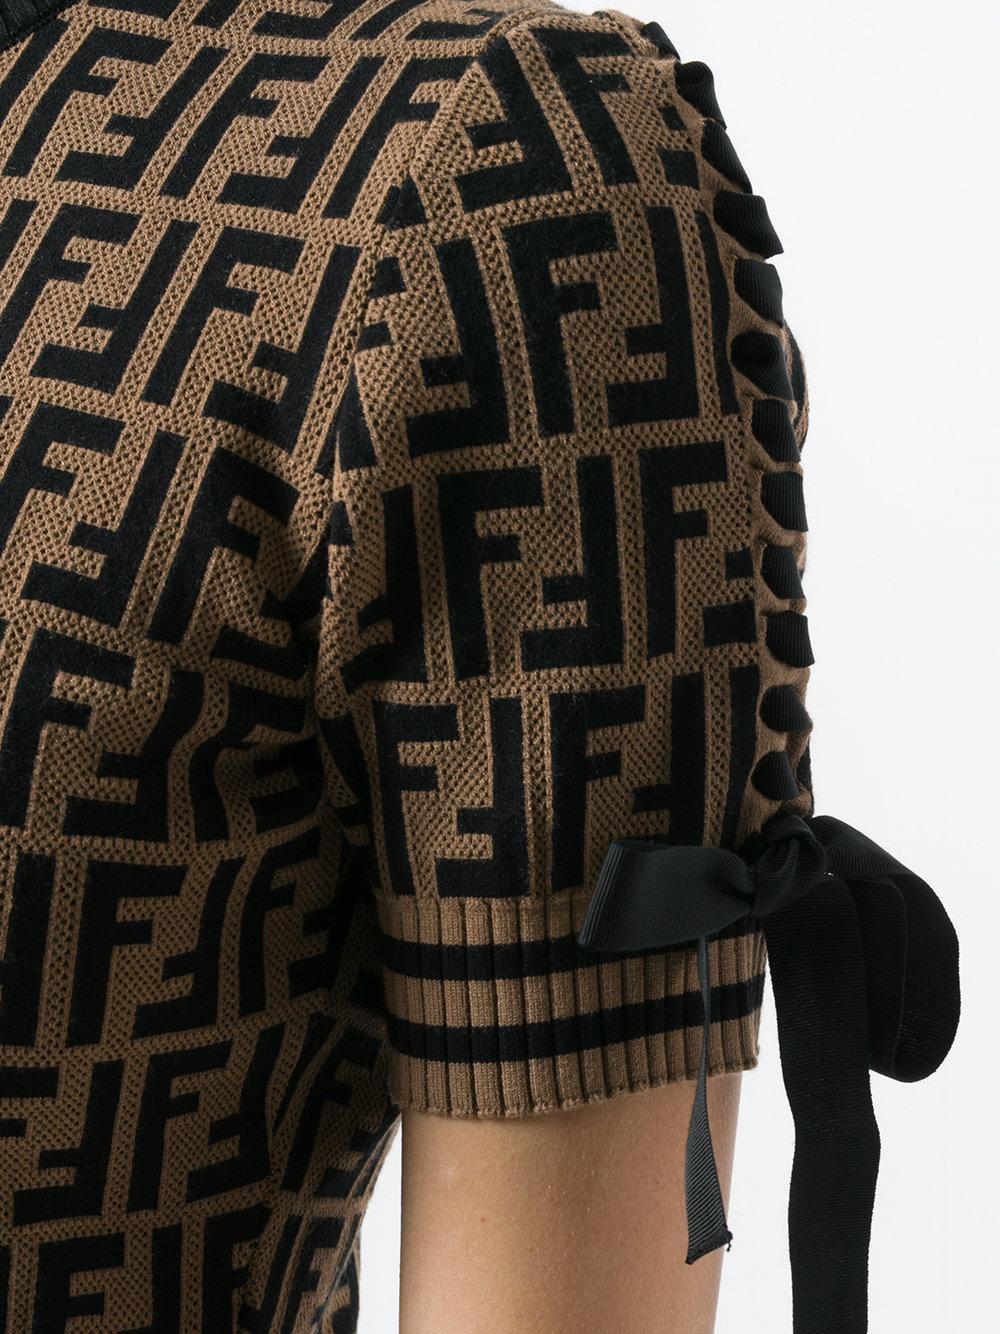 Lyst - Fendi Logo Short-sleeve Sweater in Brown